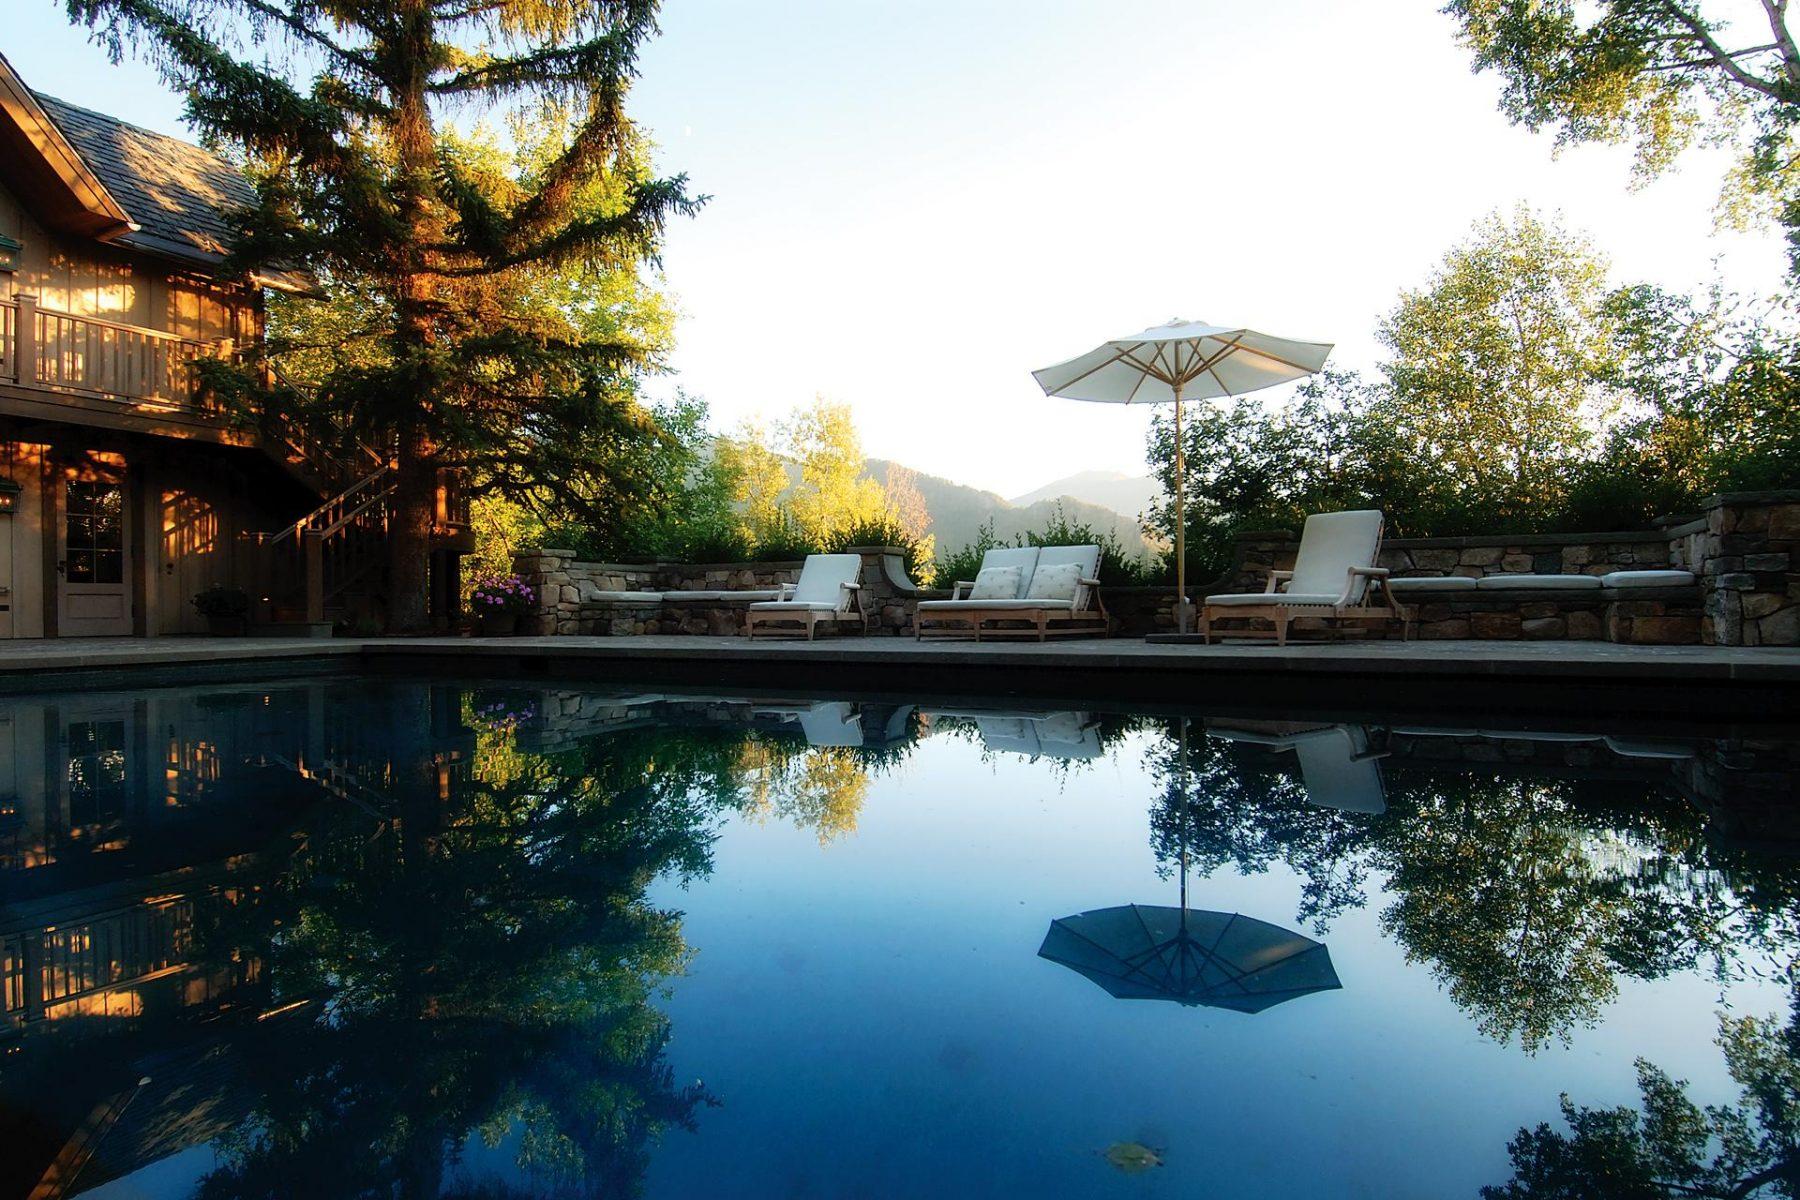 Aspen Residence Landscape Architecture